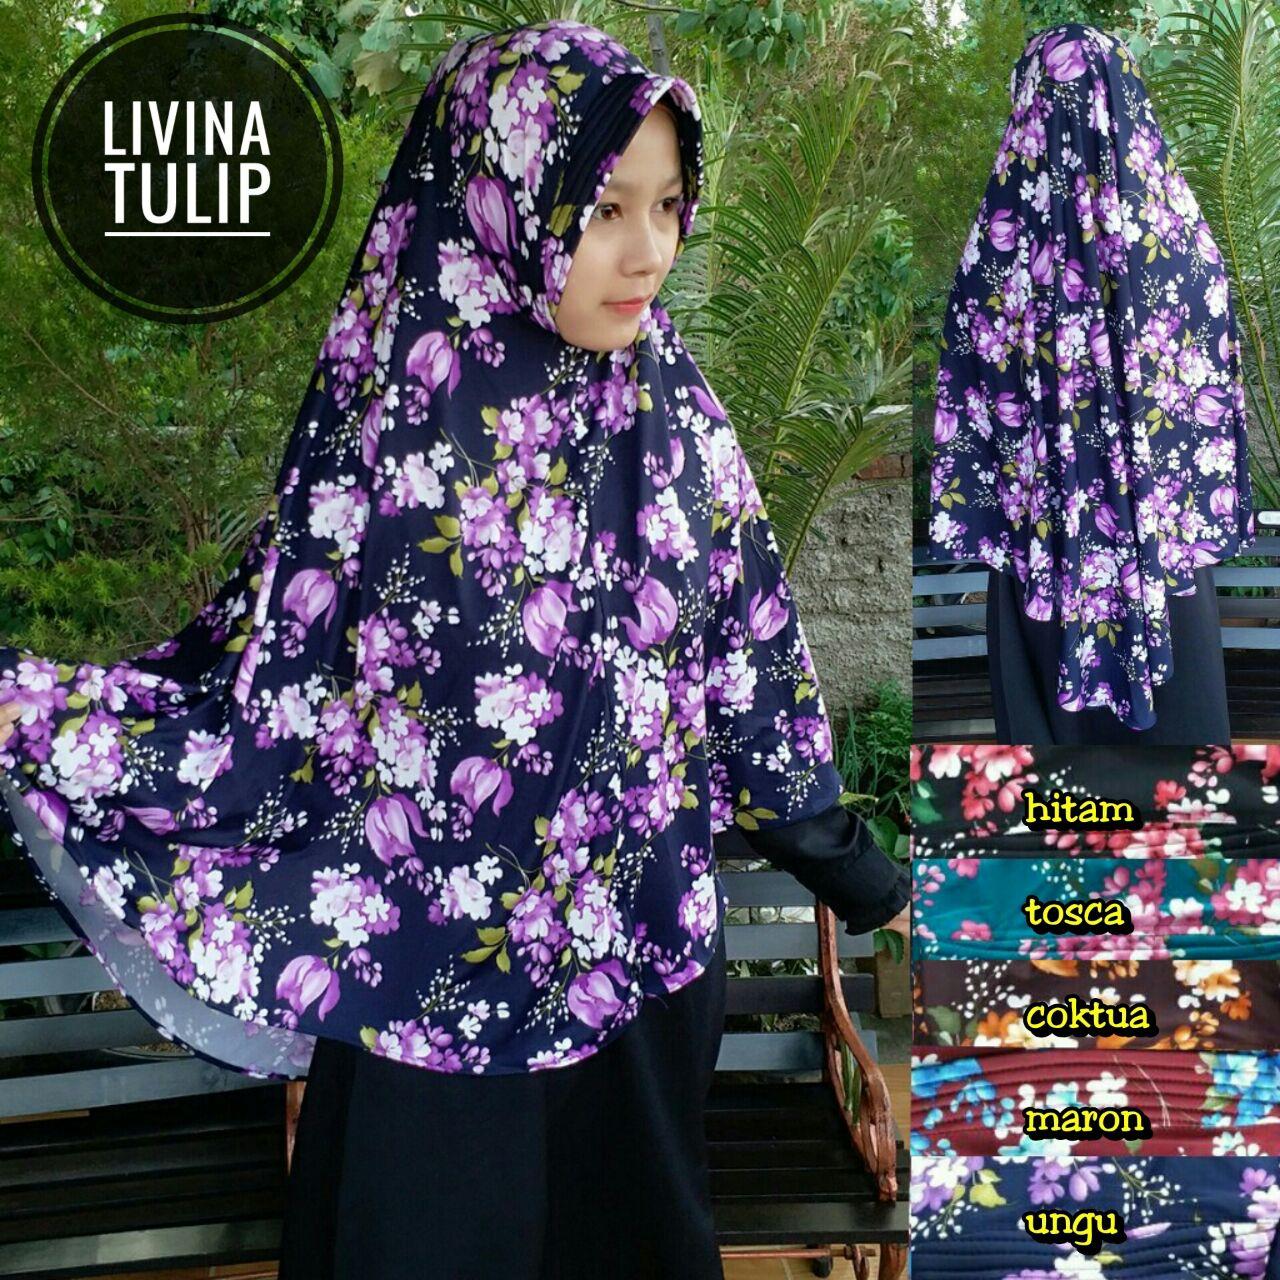 Livina Tulip 35 38 45 640 SG Jilbab